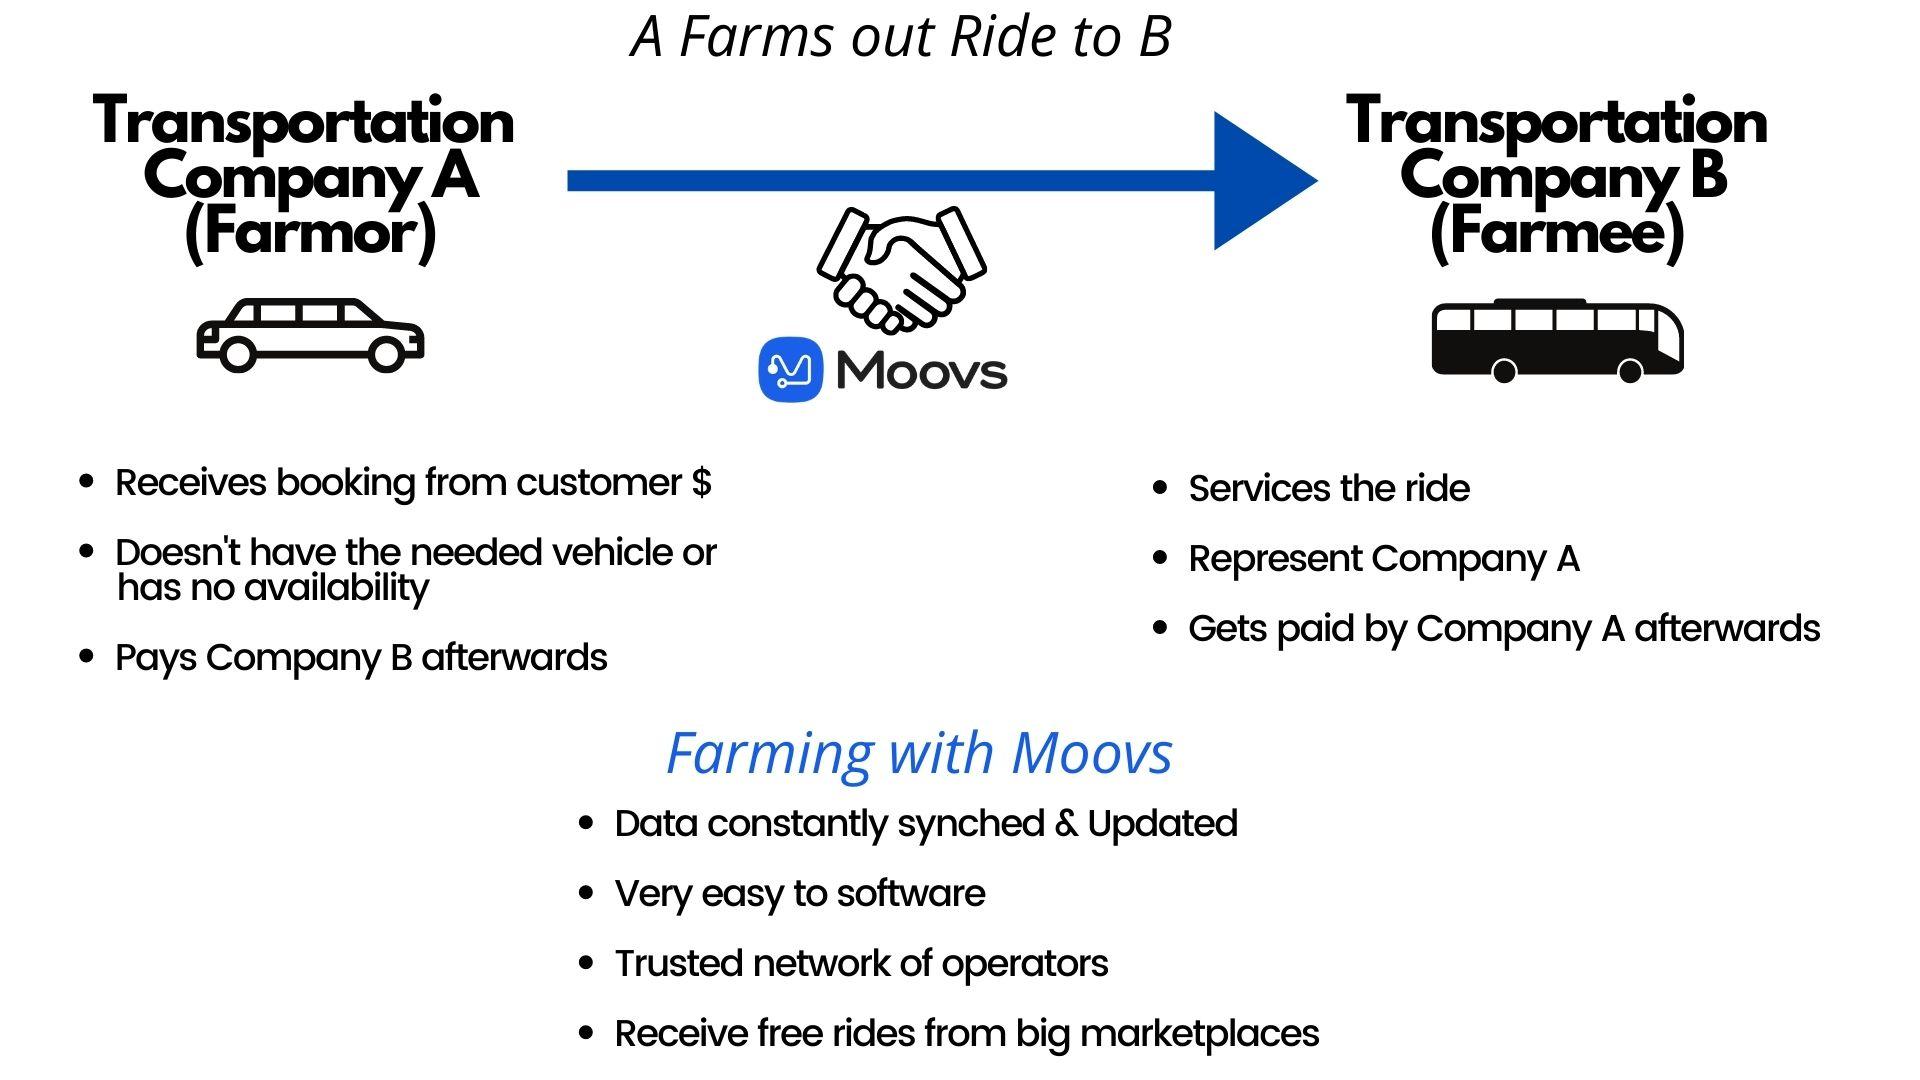 farm-out-black-car-service-moovs